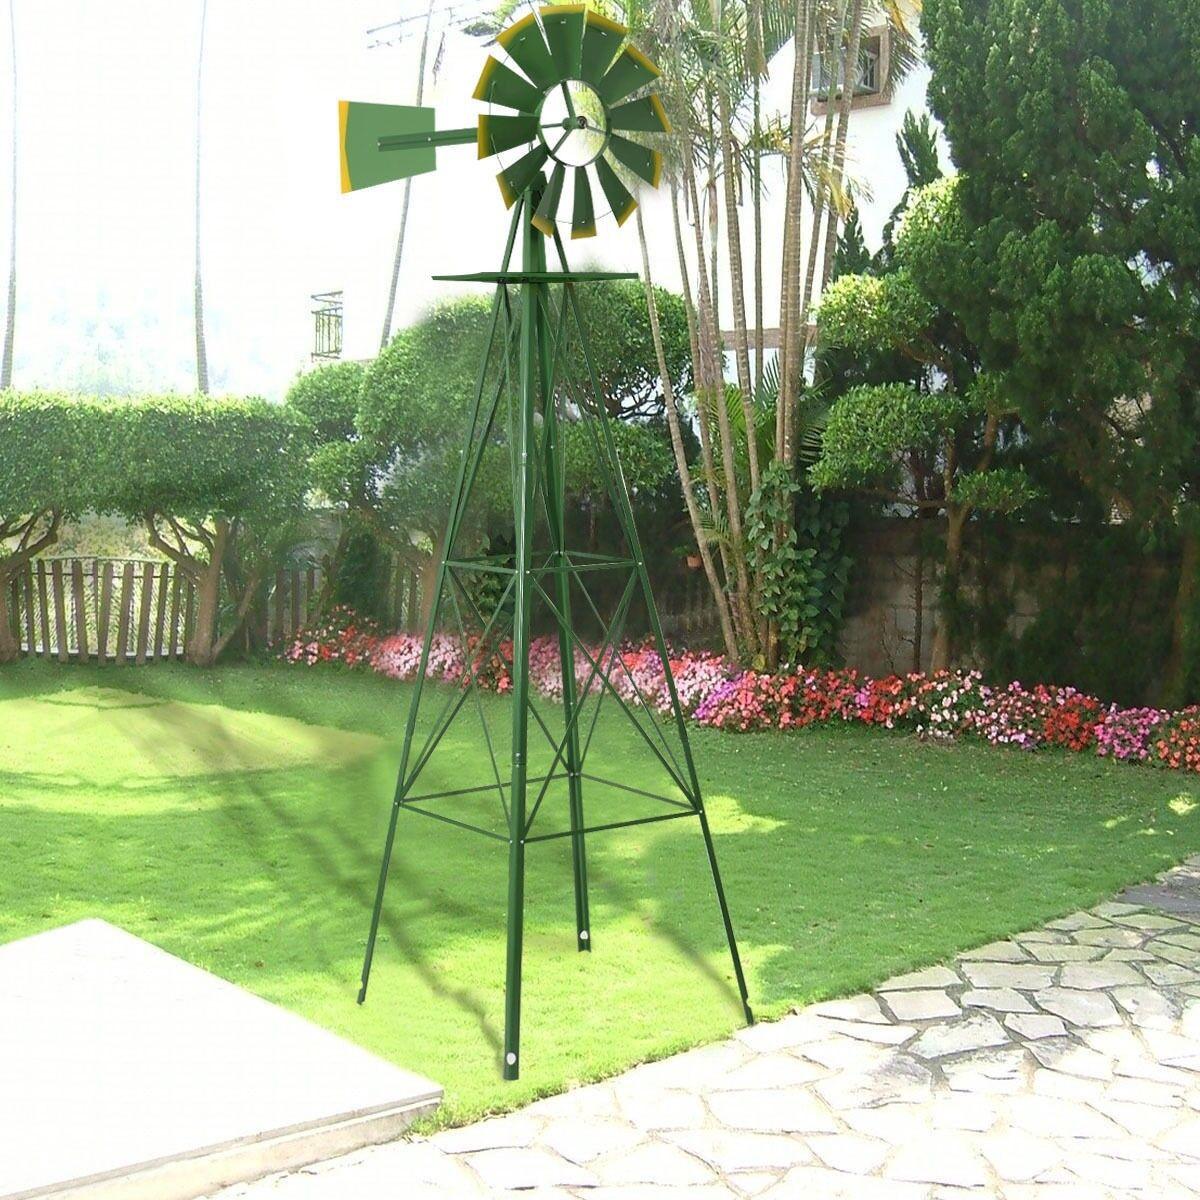 8' foot Grün Gelb Ornamental Garden Wind Windmill Wheel Steel Blades Novelty